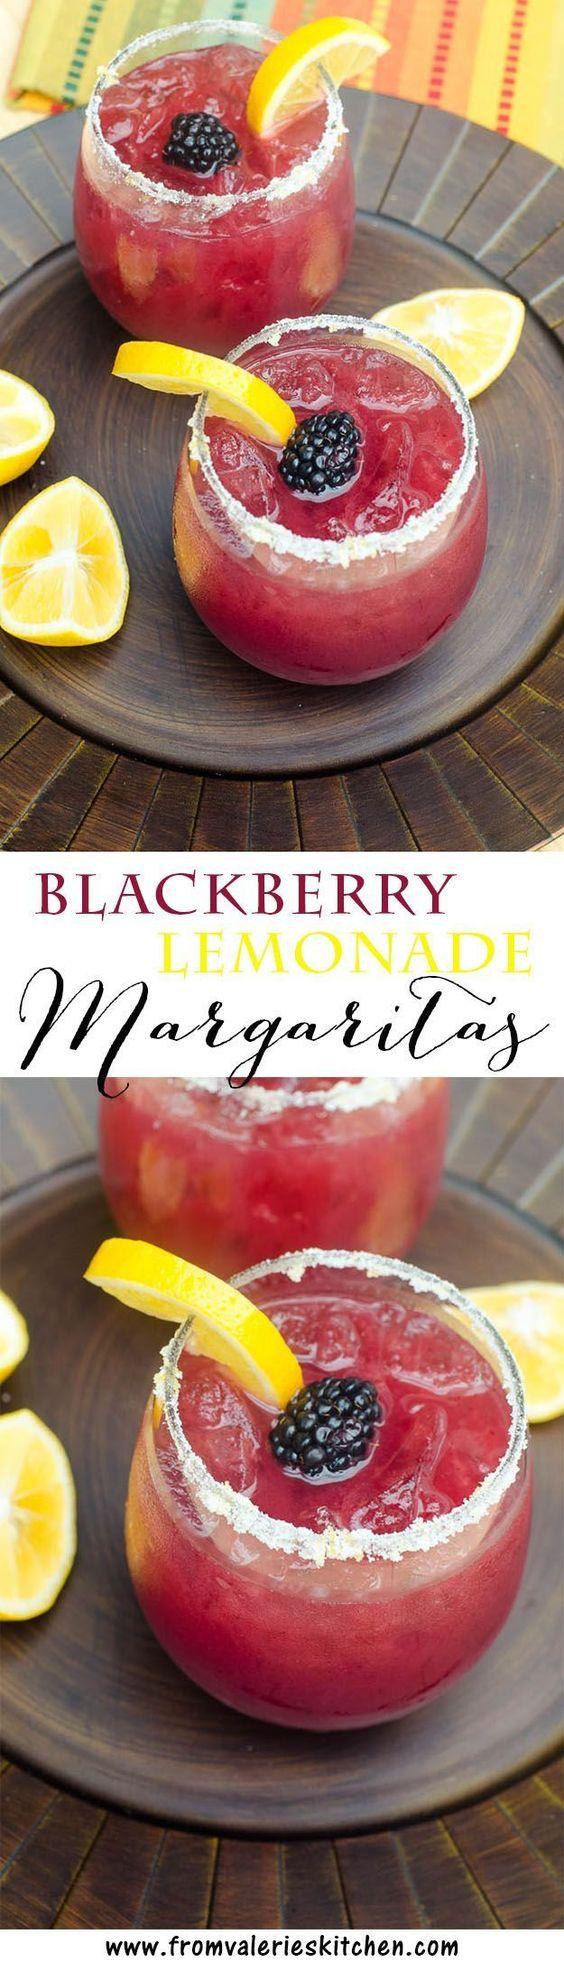 Blackberry lemonade margaritas recipe best smartphone for Party drinks with tequila